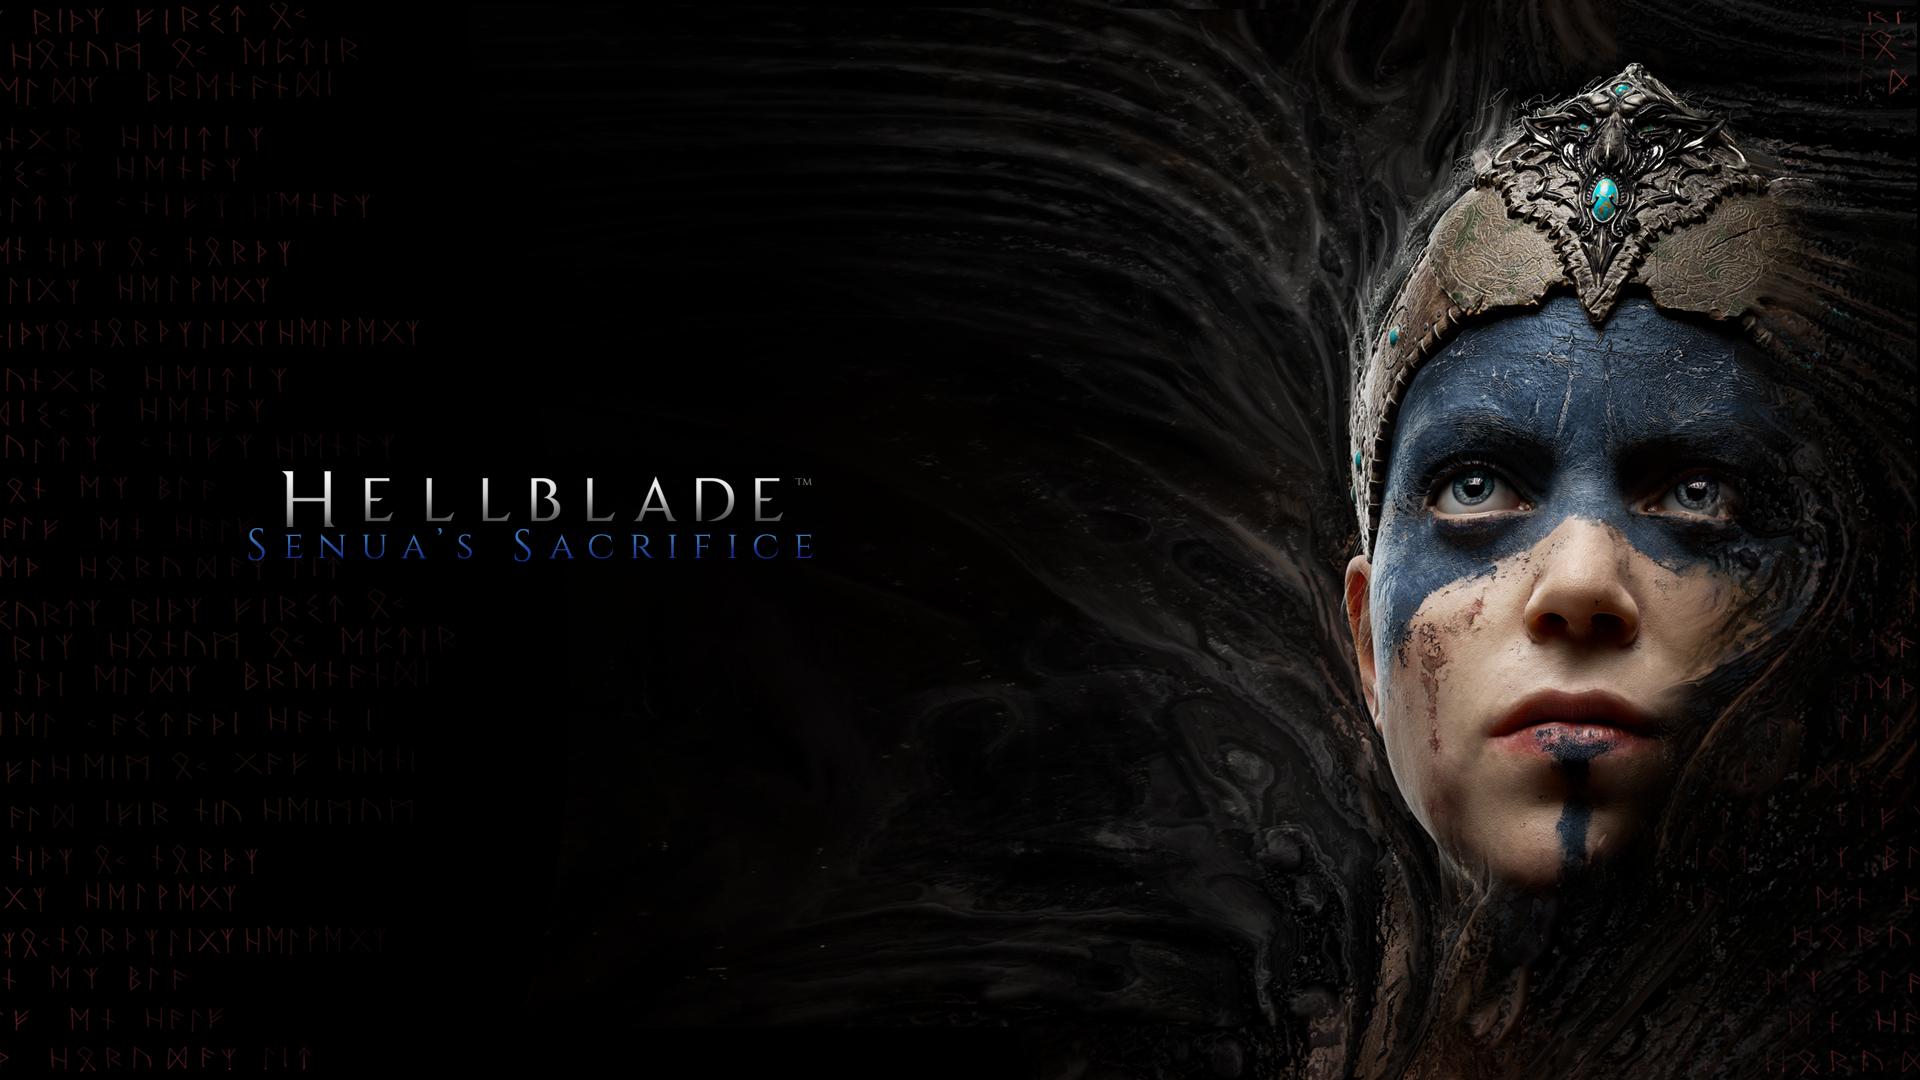 Hellblade_SenuasSacrifice_Poster